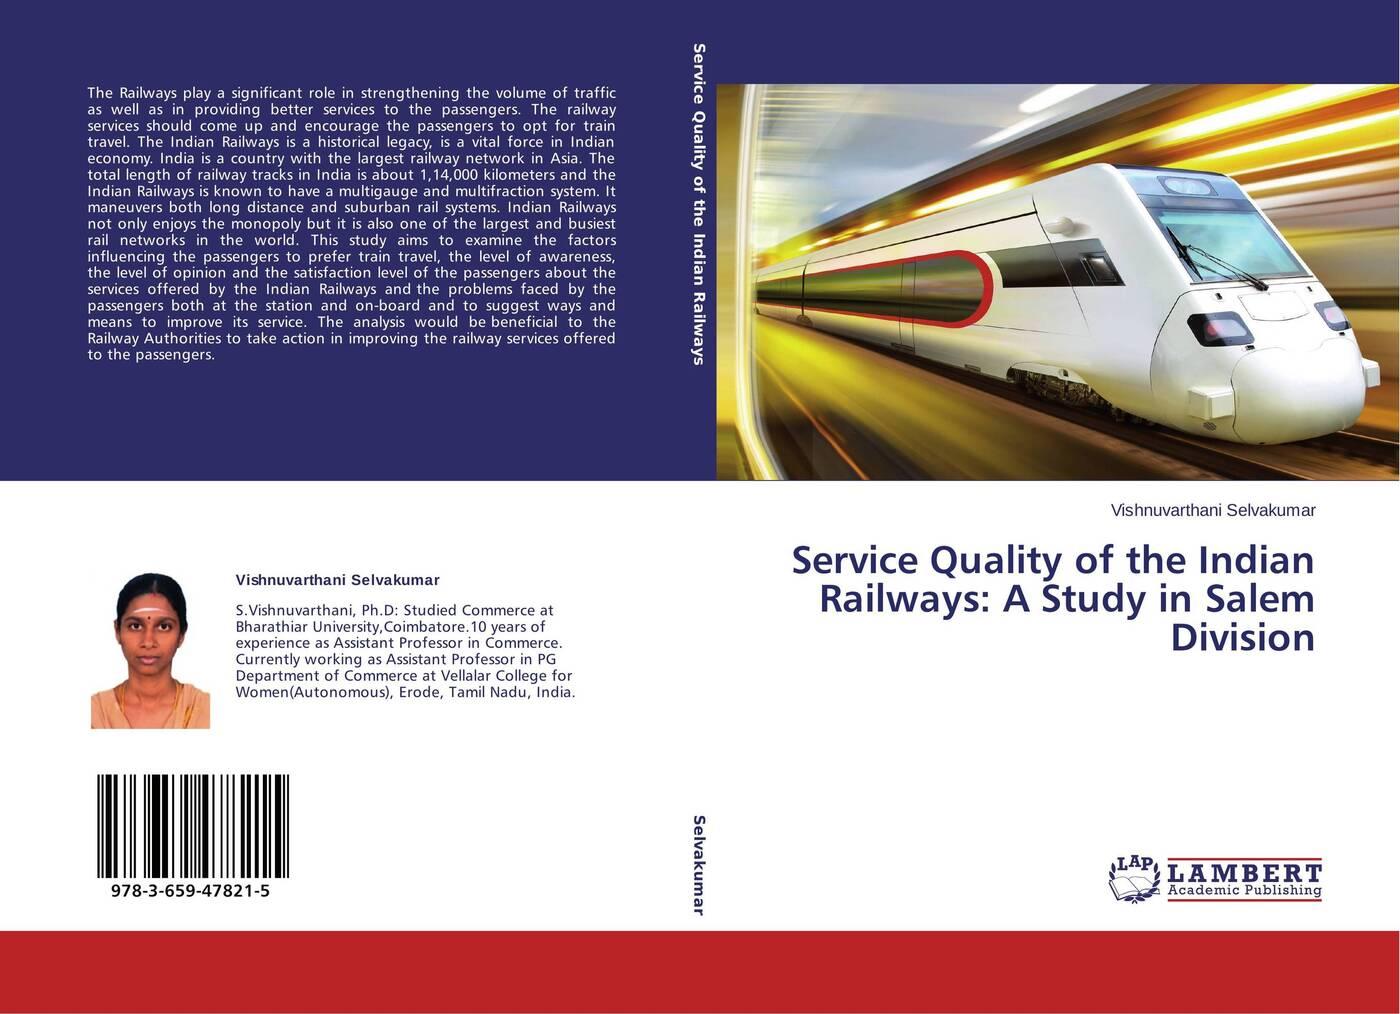 Vishnuvarthani Selvakumar Service Quality of the Indian Railways: A Study in Salem Division gandhi mahatma third class in indian railways